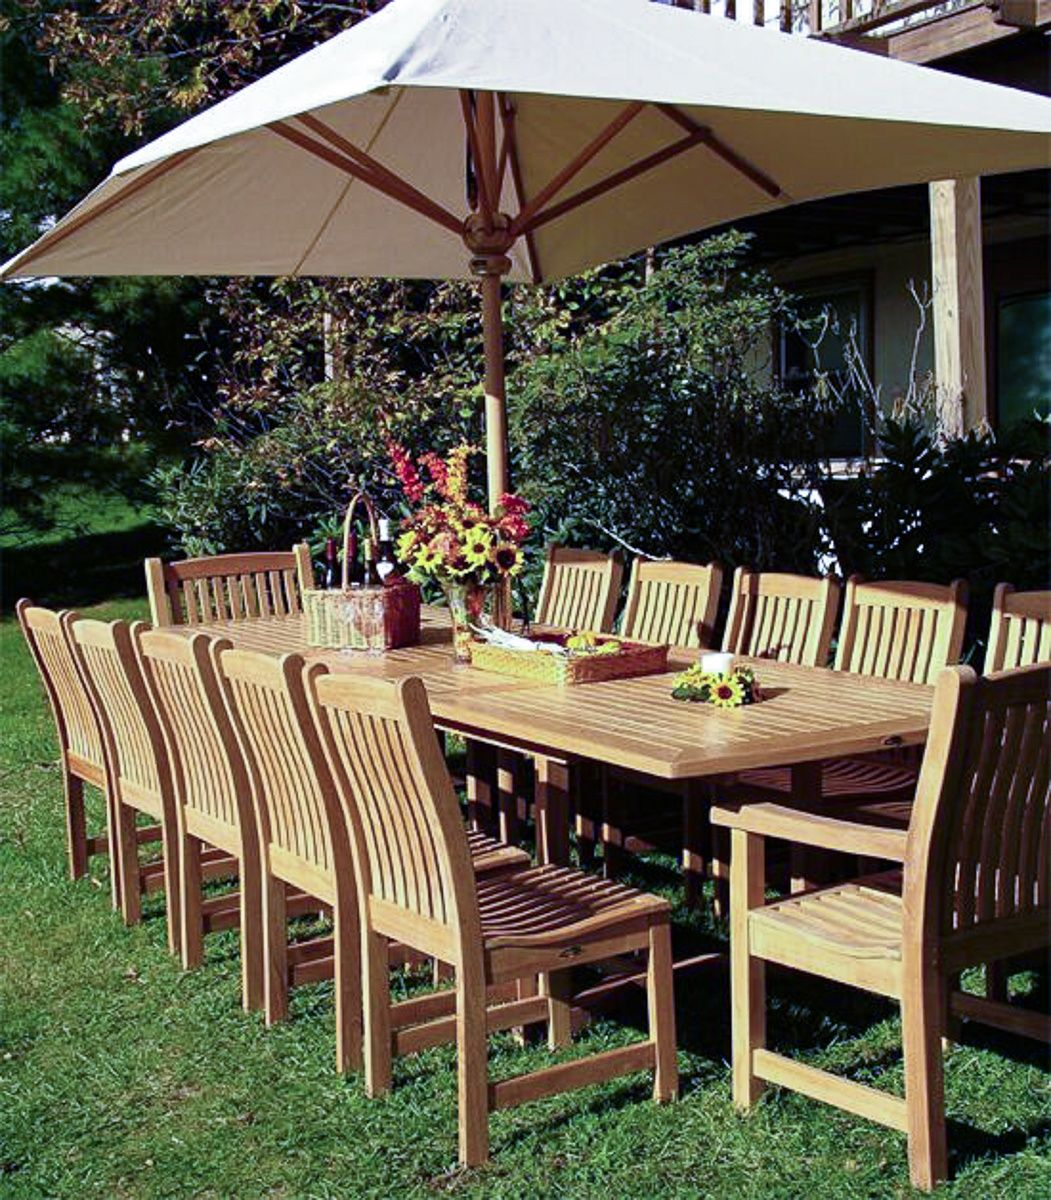 13 Pc Grand Veranda Teak Dining Set Discount Outdoor Furniture